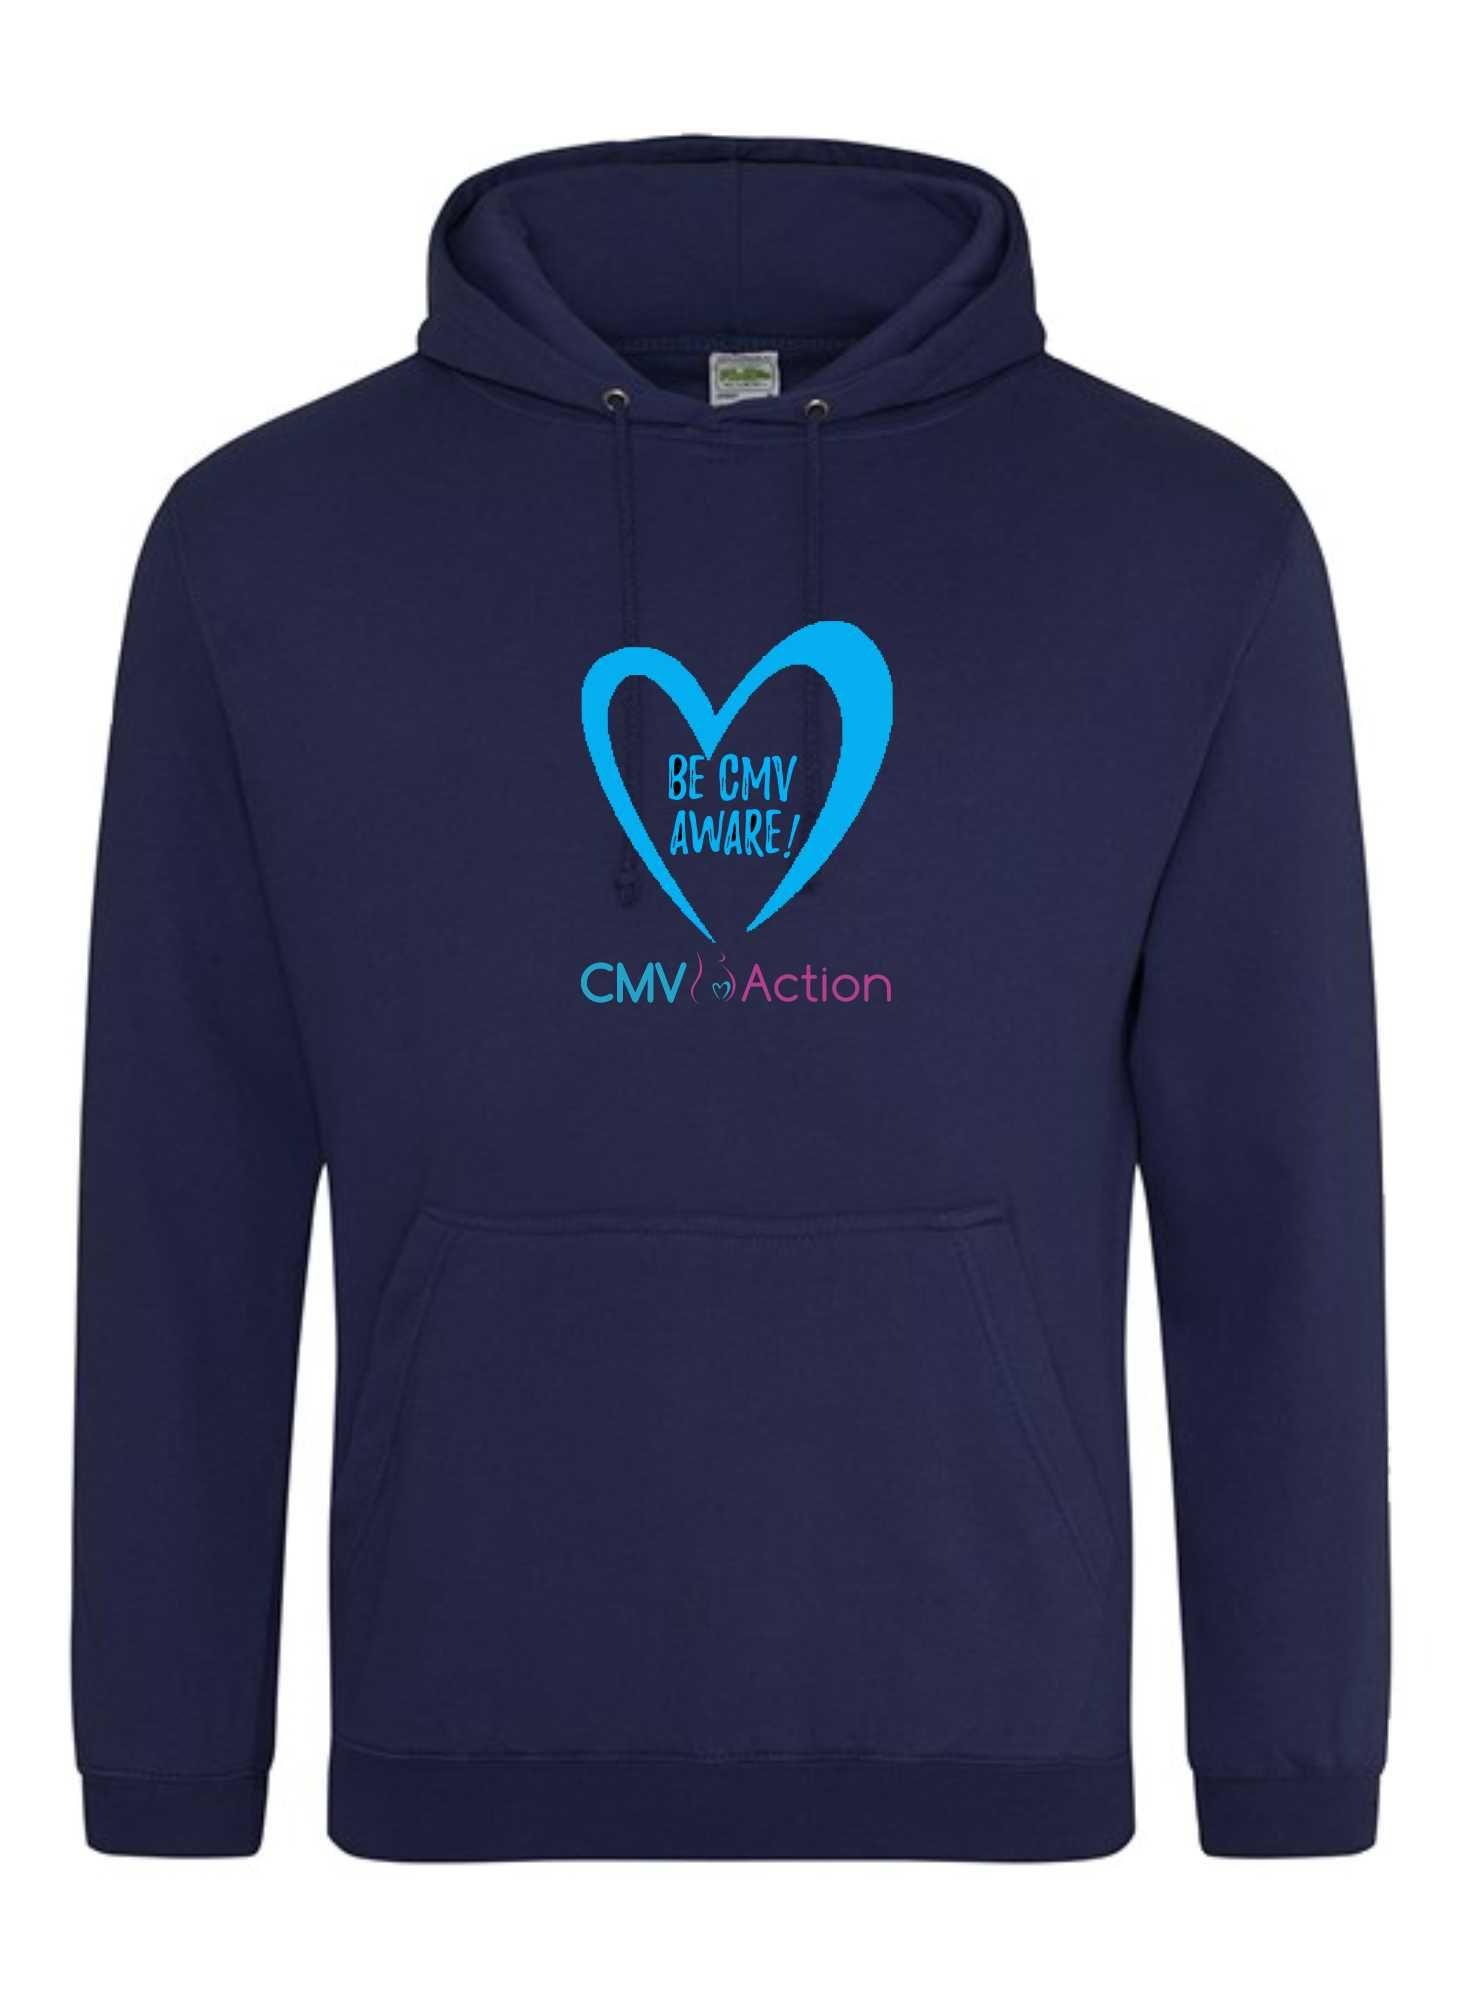 CMV- Blue Heart Hoodie (Oxford Navy) (Unisex)